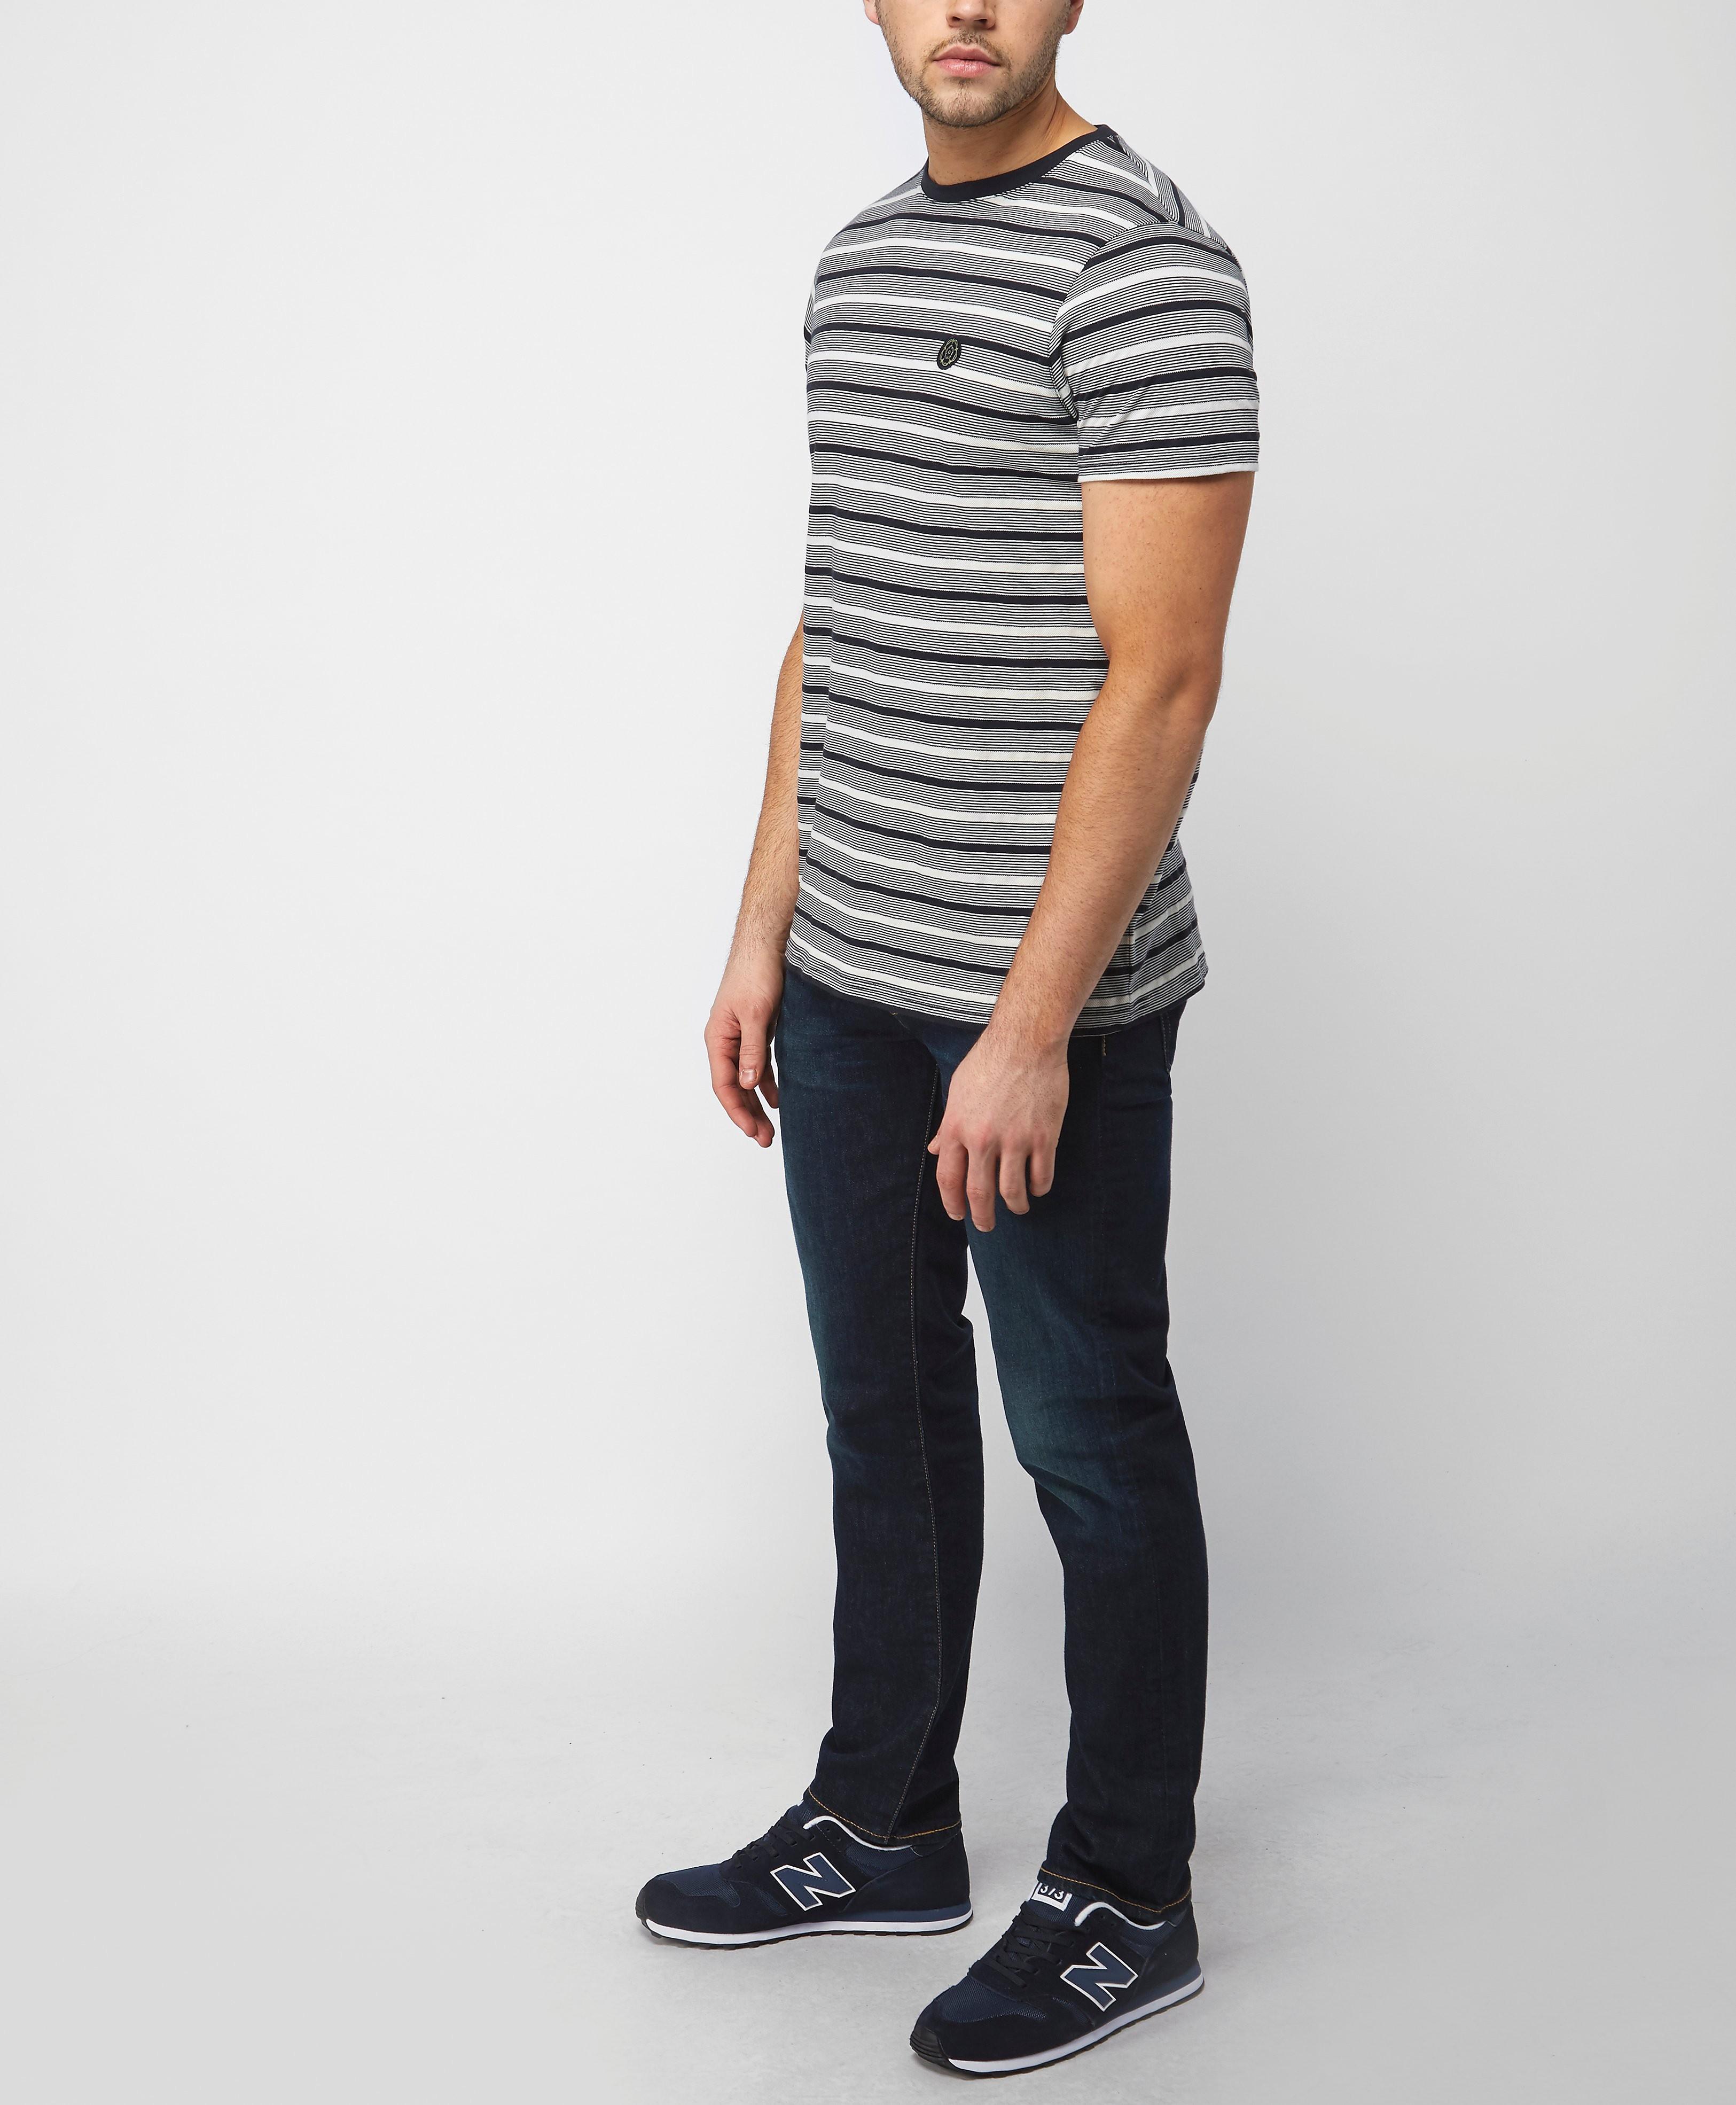 Nicholas Deakins Shadow Pique Stripe T-Shirt